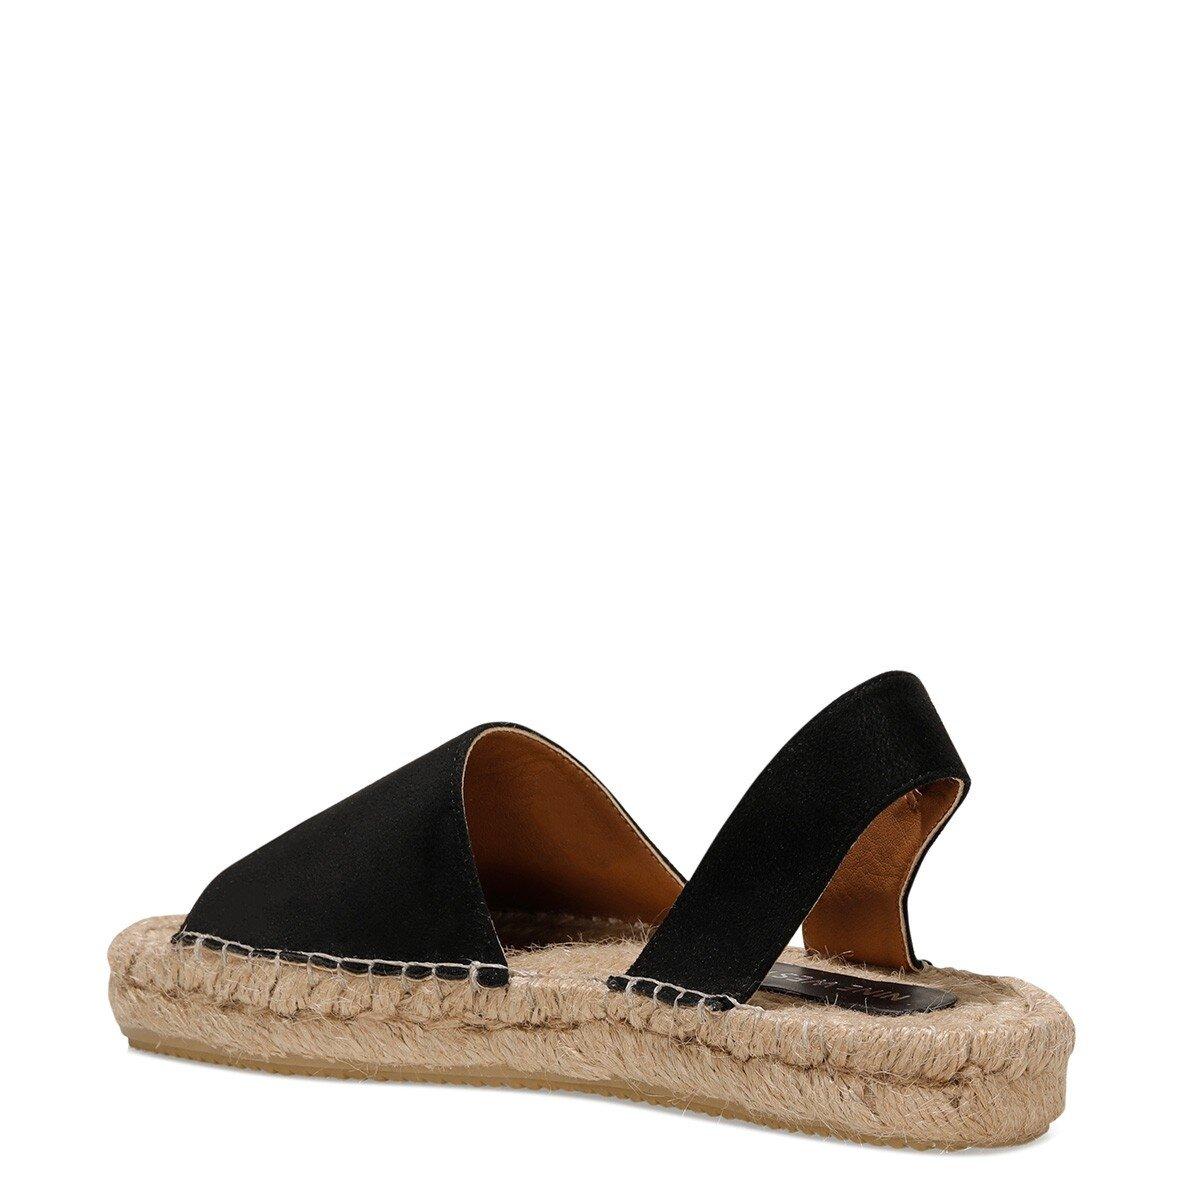 RILLA-D 1FX Siyah Kadın Espadril Ayakkabı